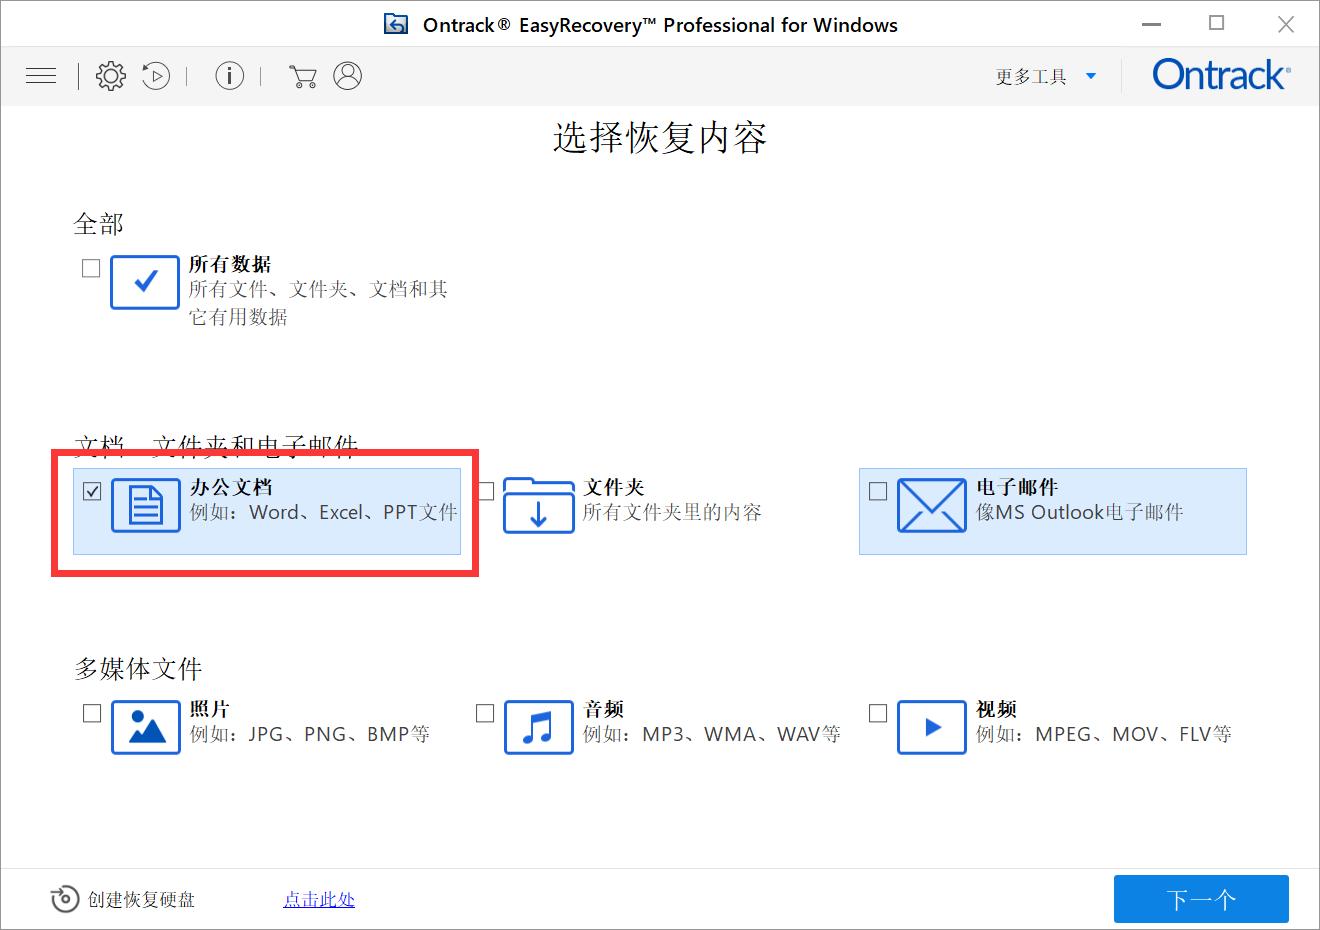 easyrecovery14版本更新功能:APFS文件支持